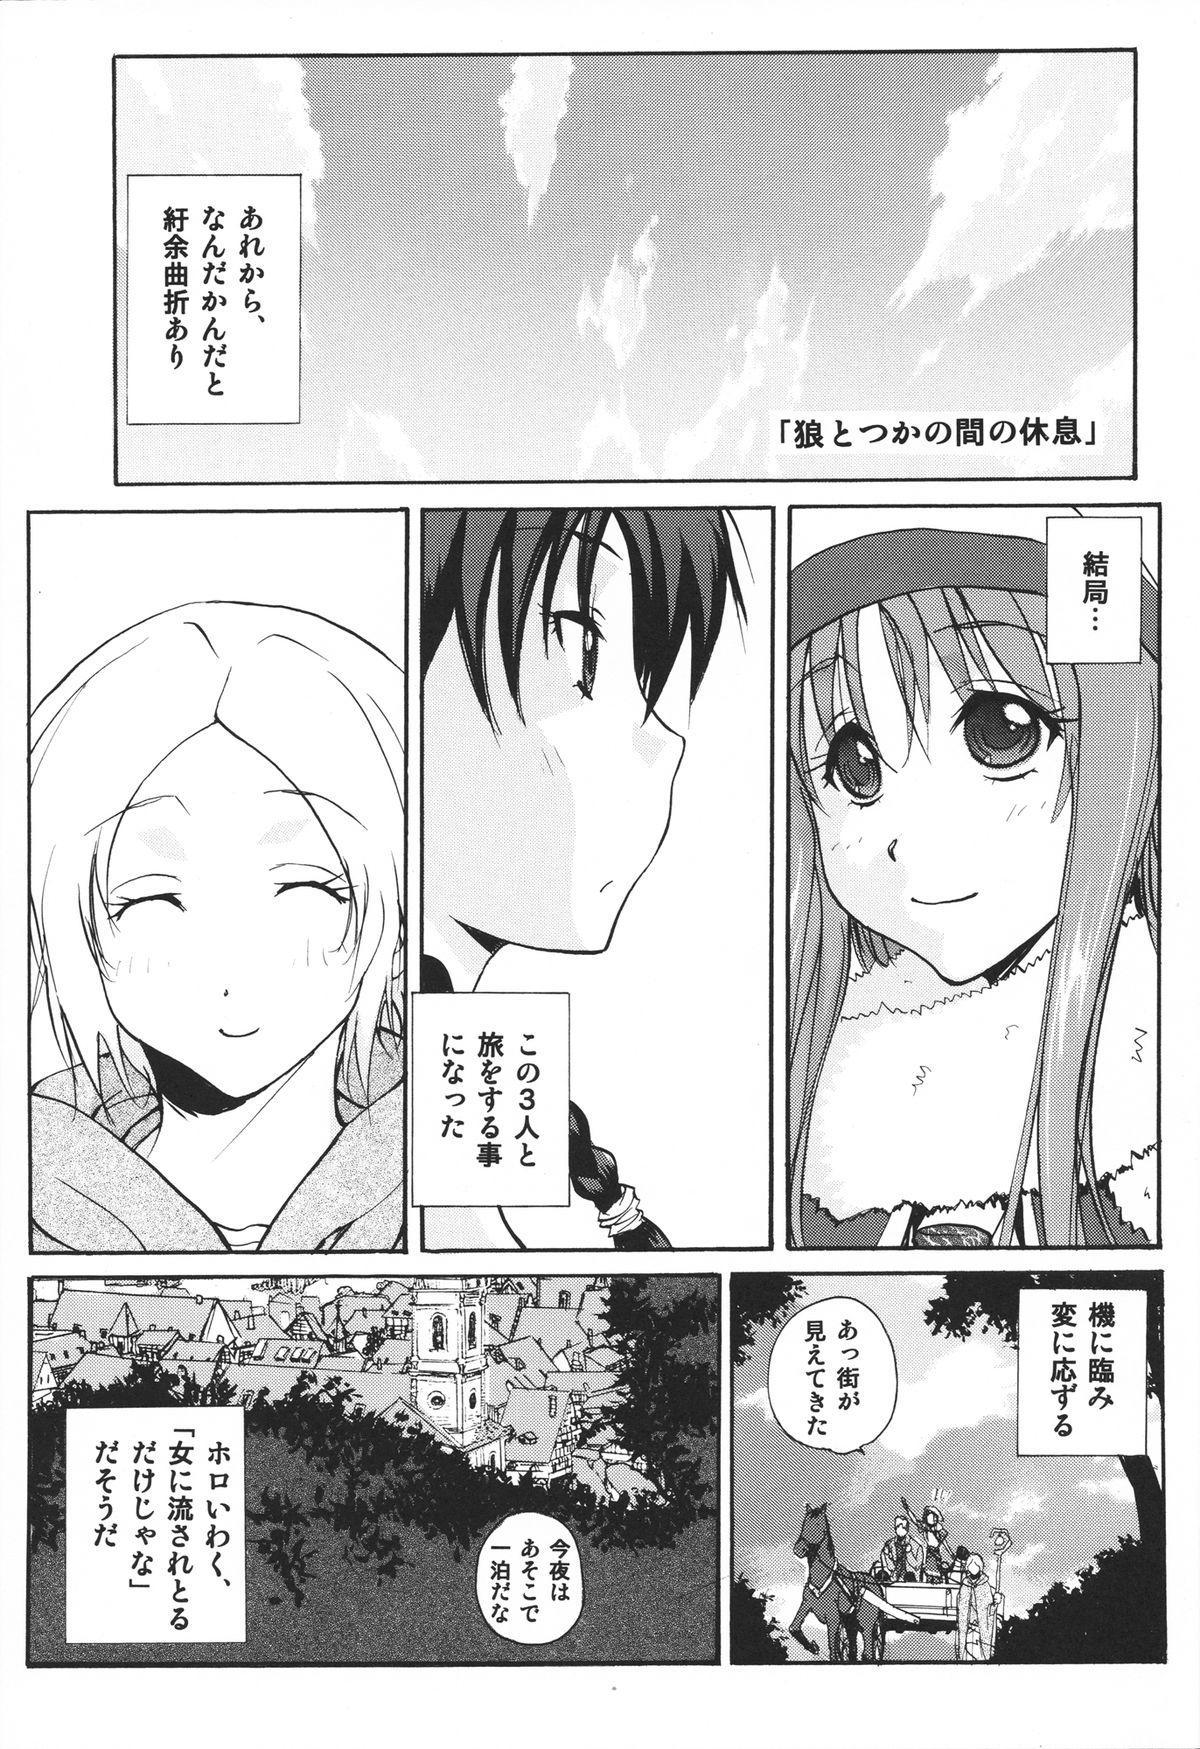 Ookami to Osage to Kohitsuji 1